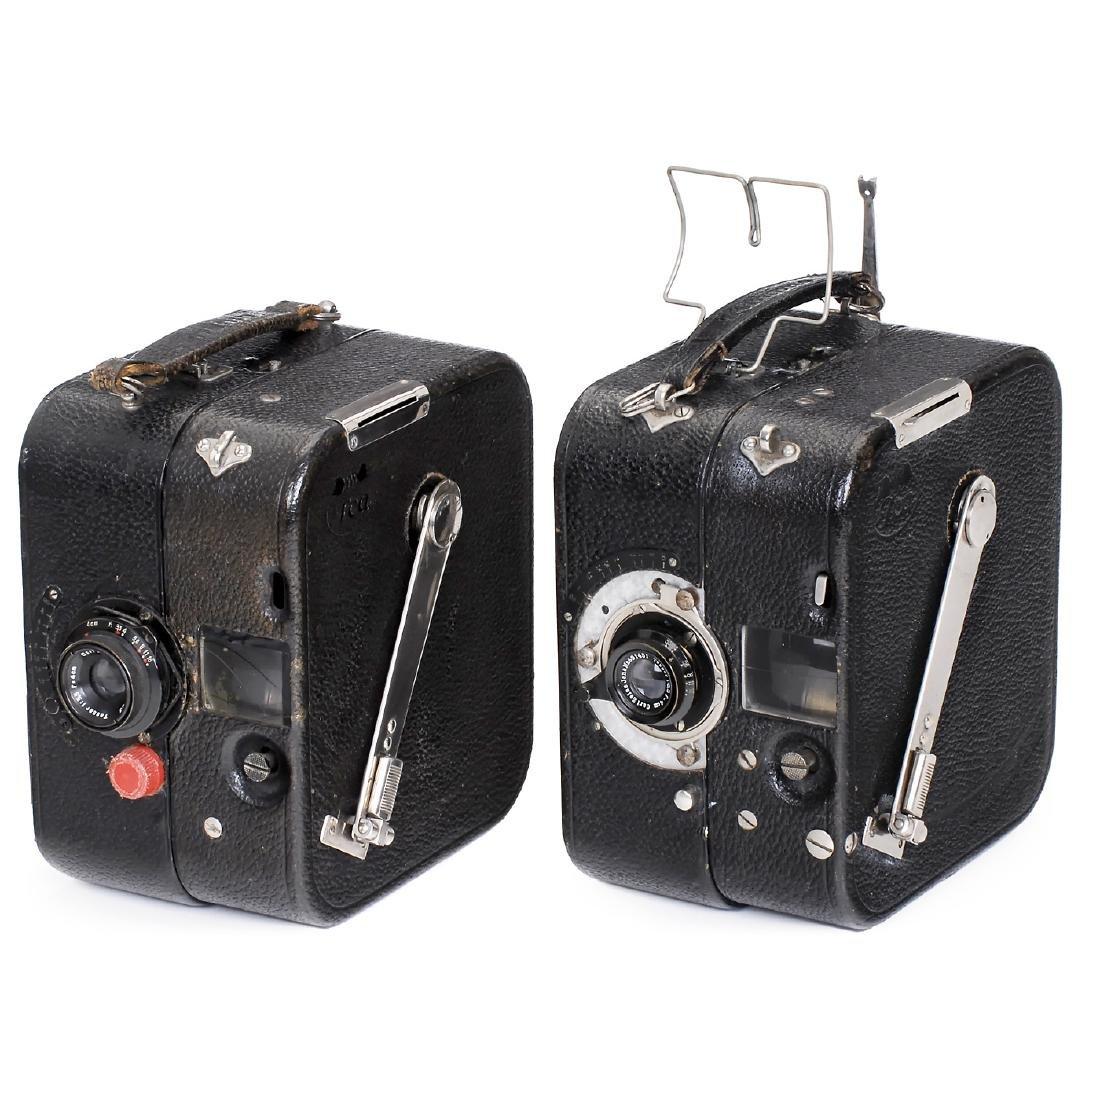 Kinamo 25 35mm Movie Camera, c. 1924